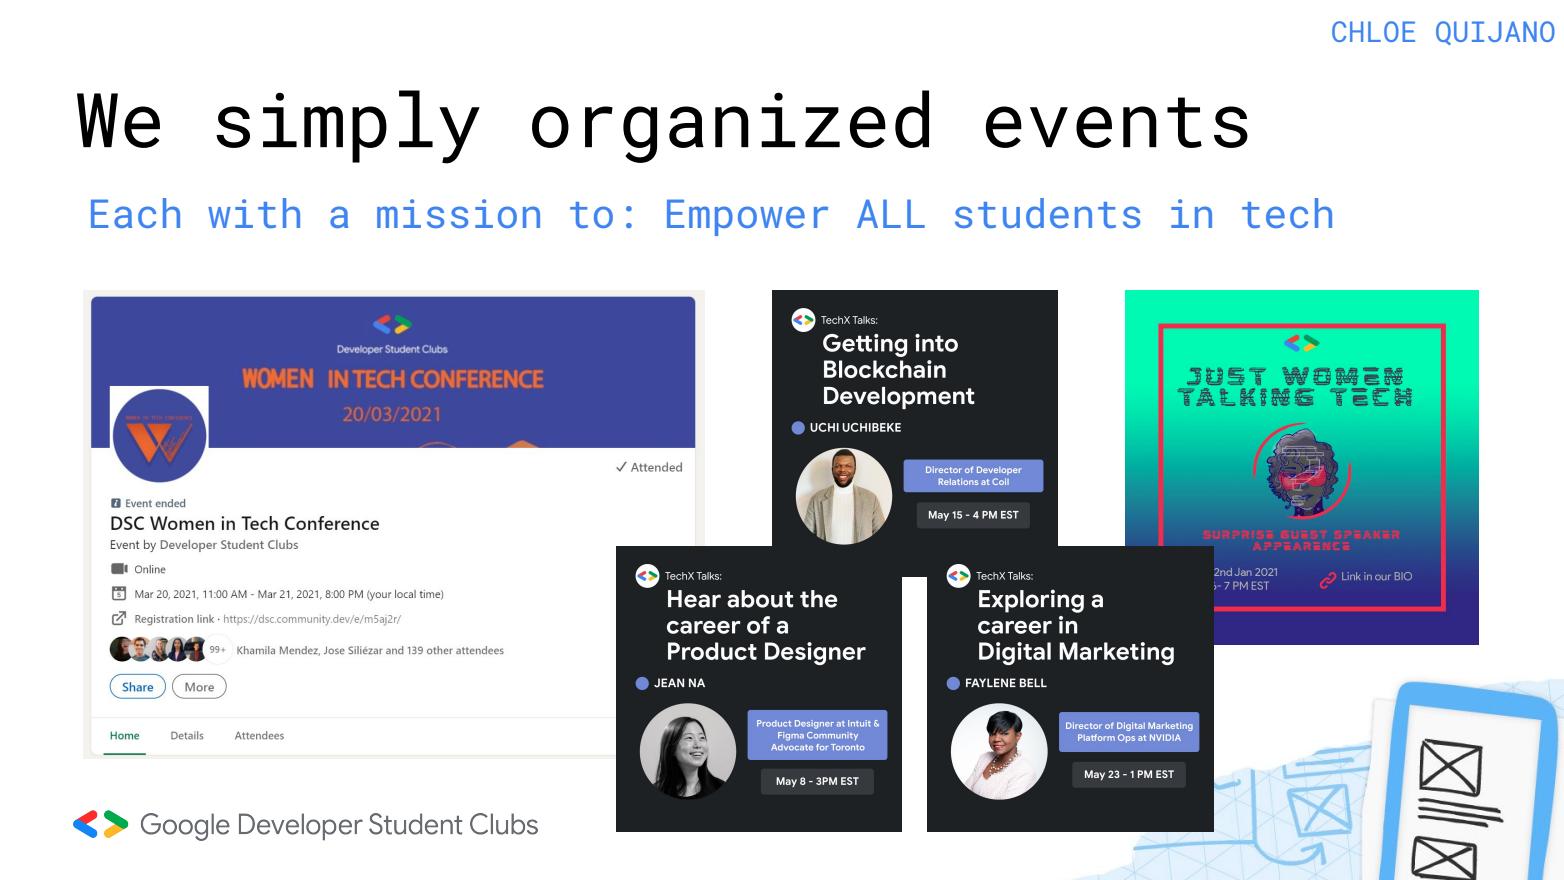 Image shows Conference details and workshop titles